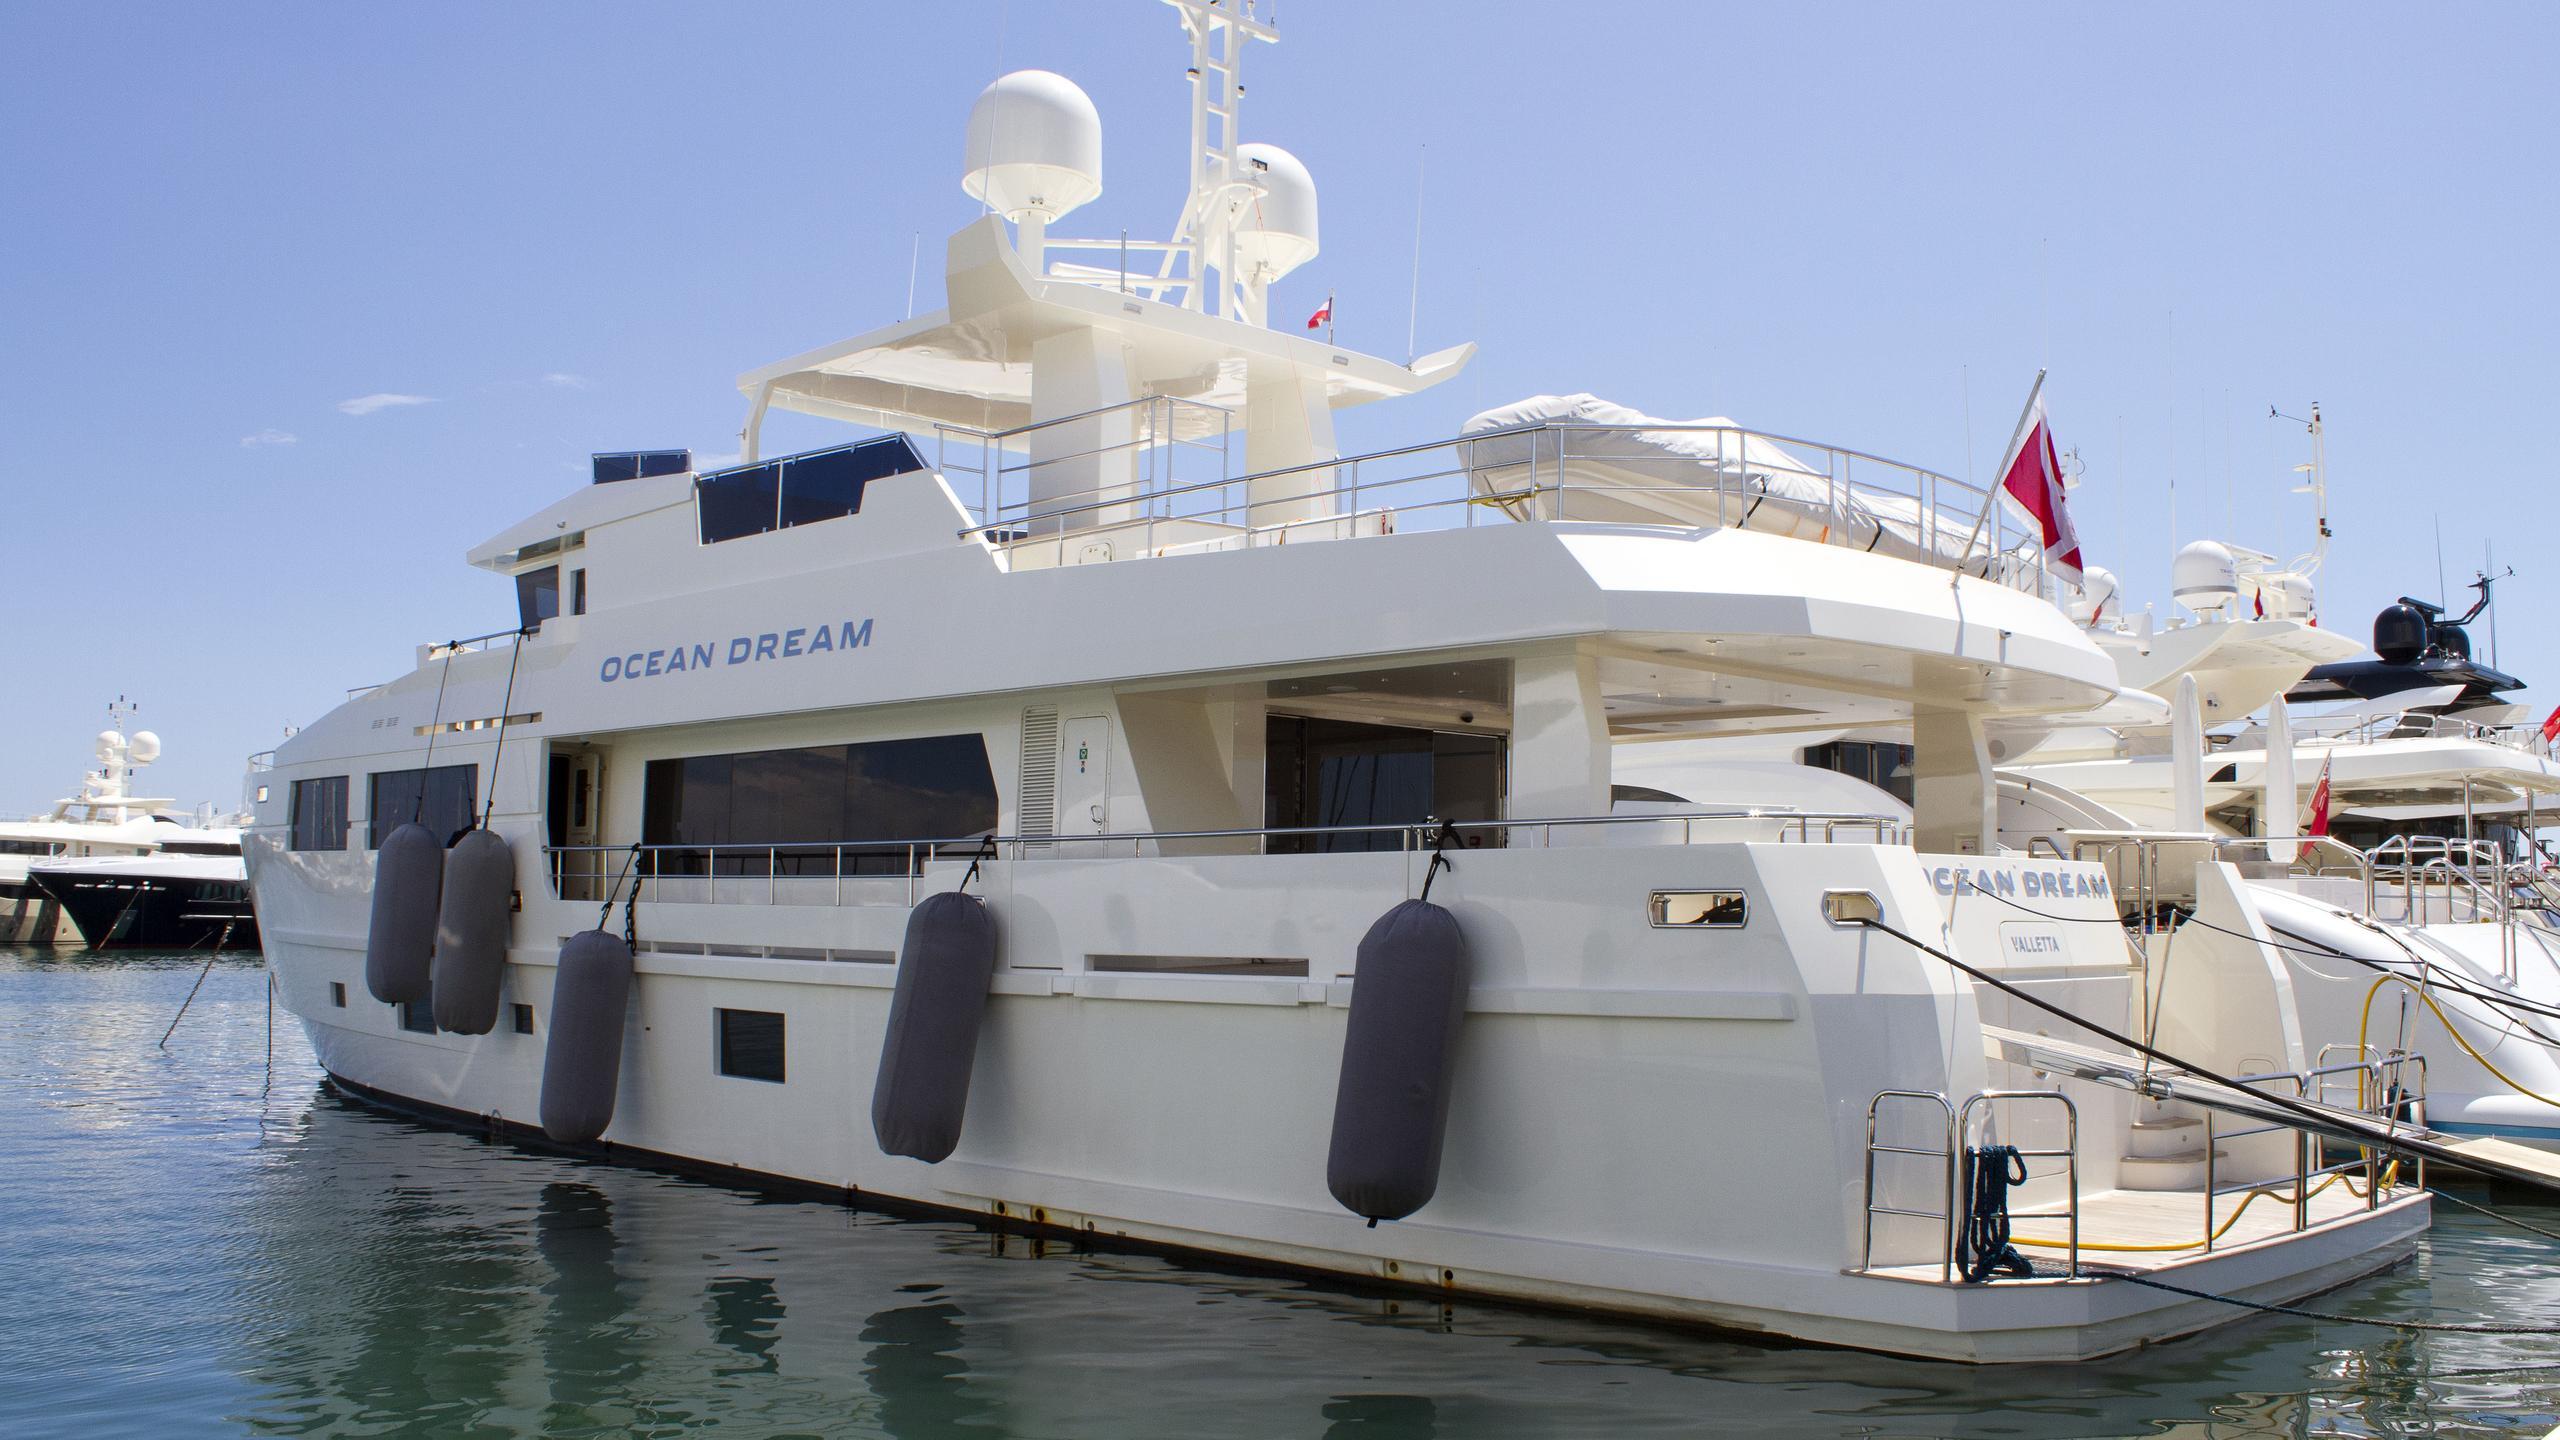 ocean dream serenitas motoryacht mengi yay 2014 32m half stern